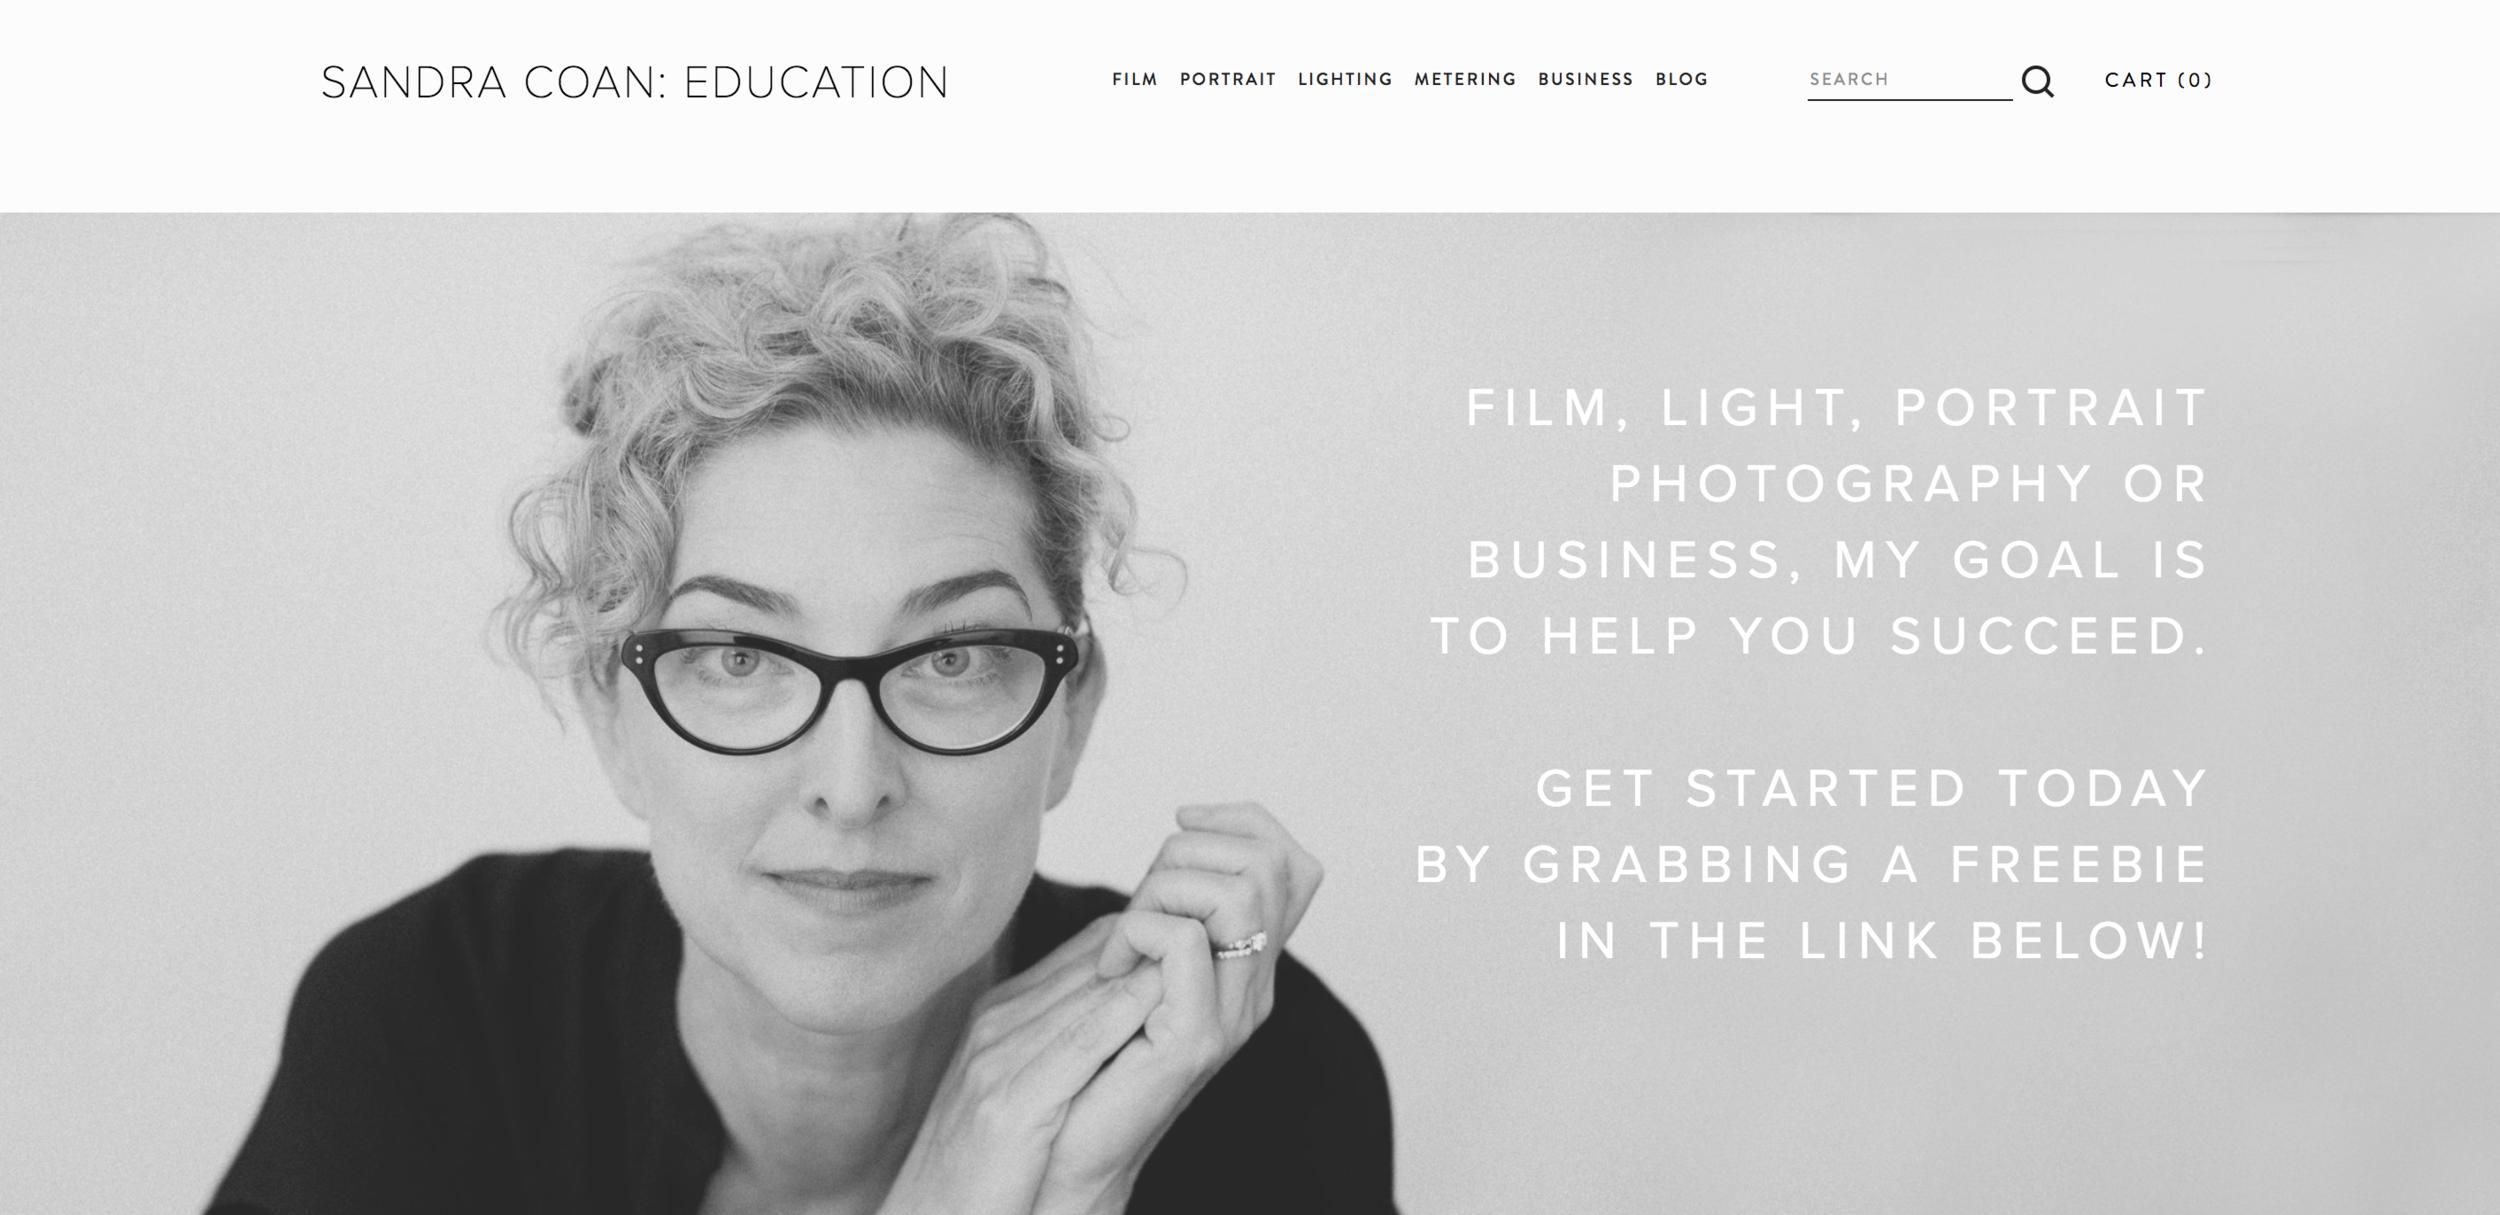 Sandra Coan education for film photographers